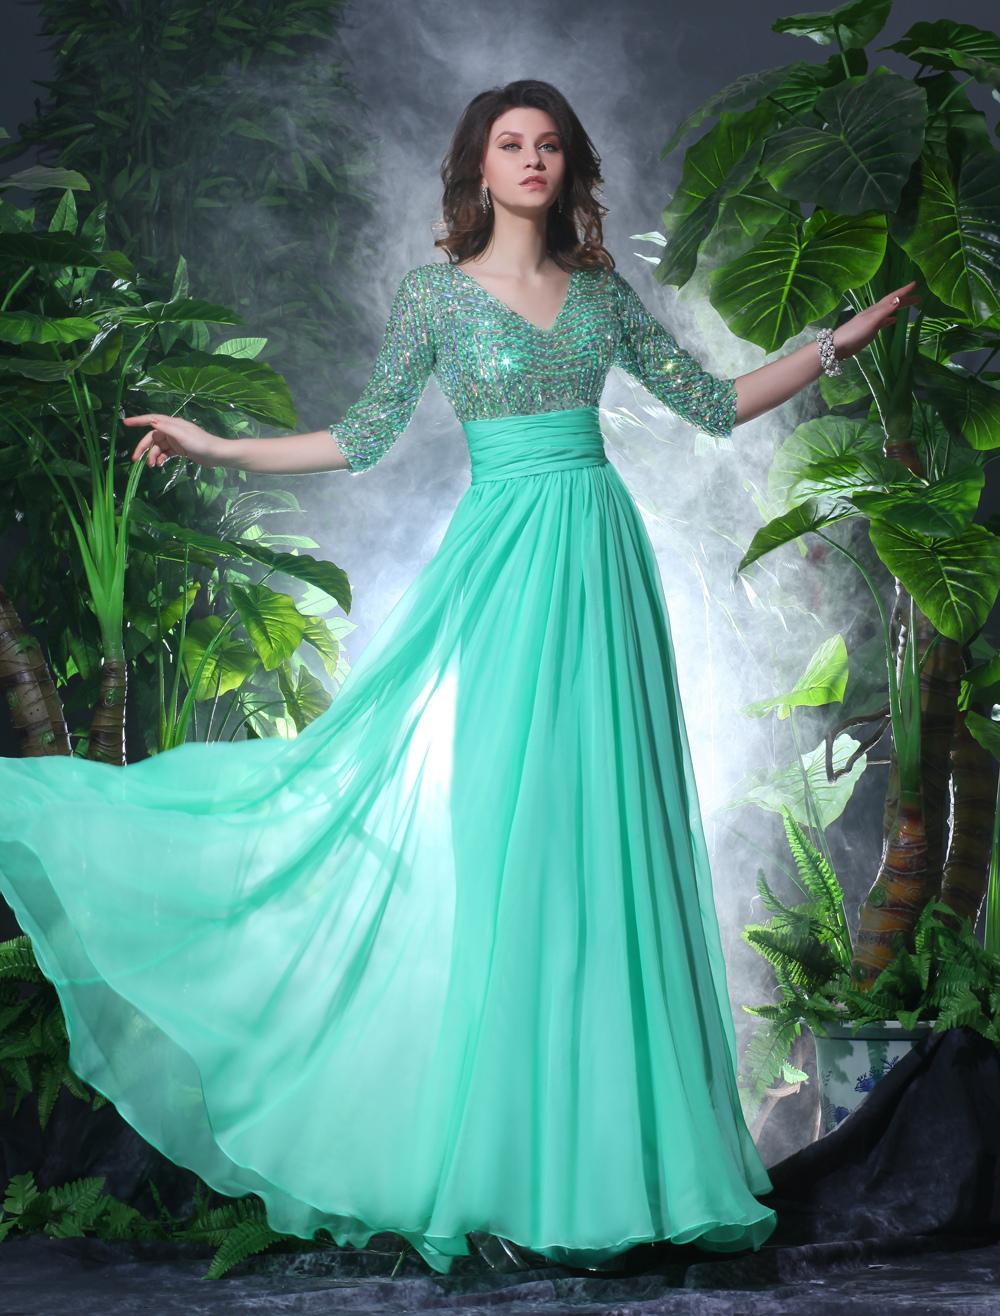 Green Evening Dress Sequins Rhinestone Cut-Out Chiffon Dress